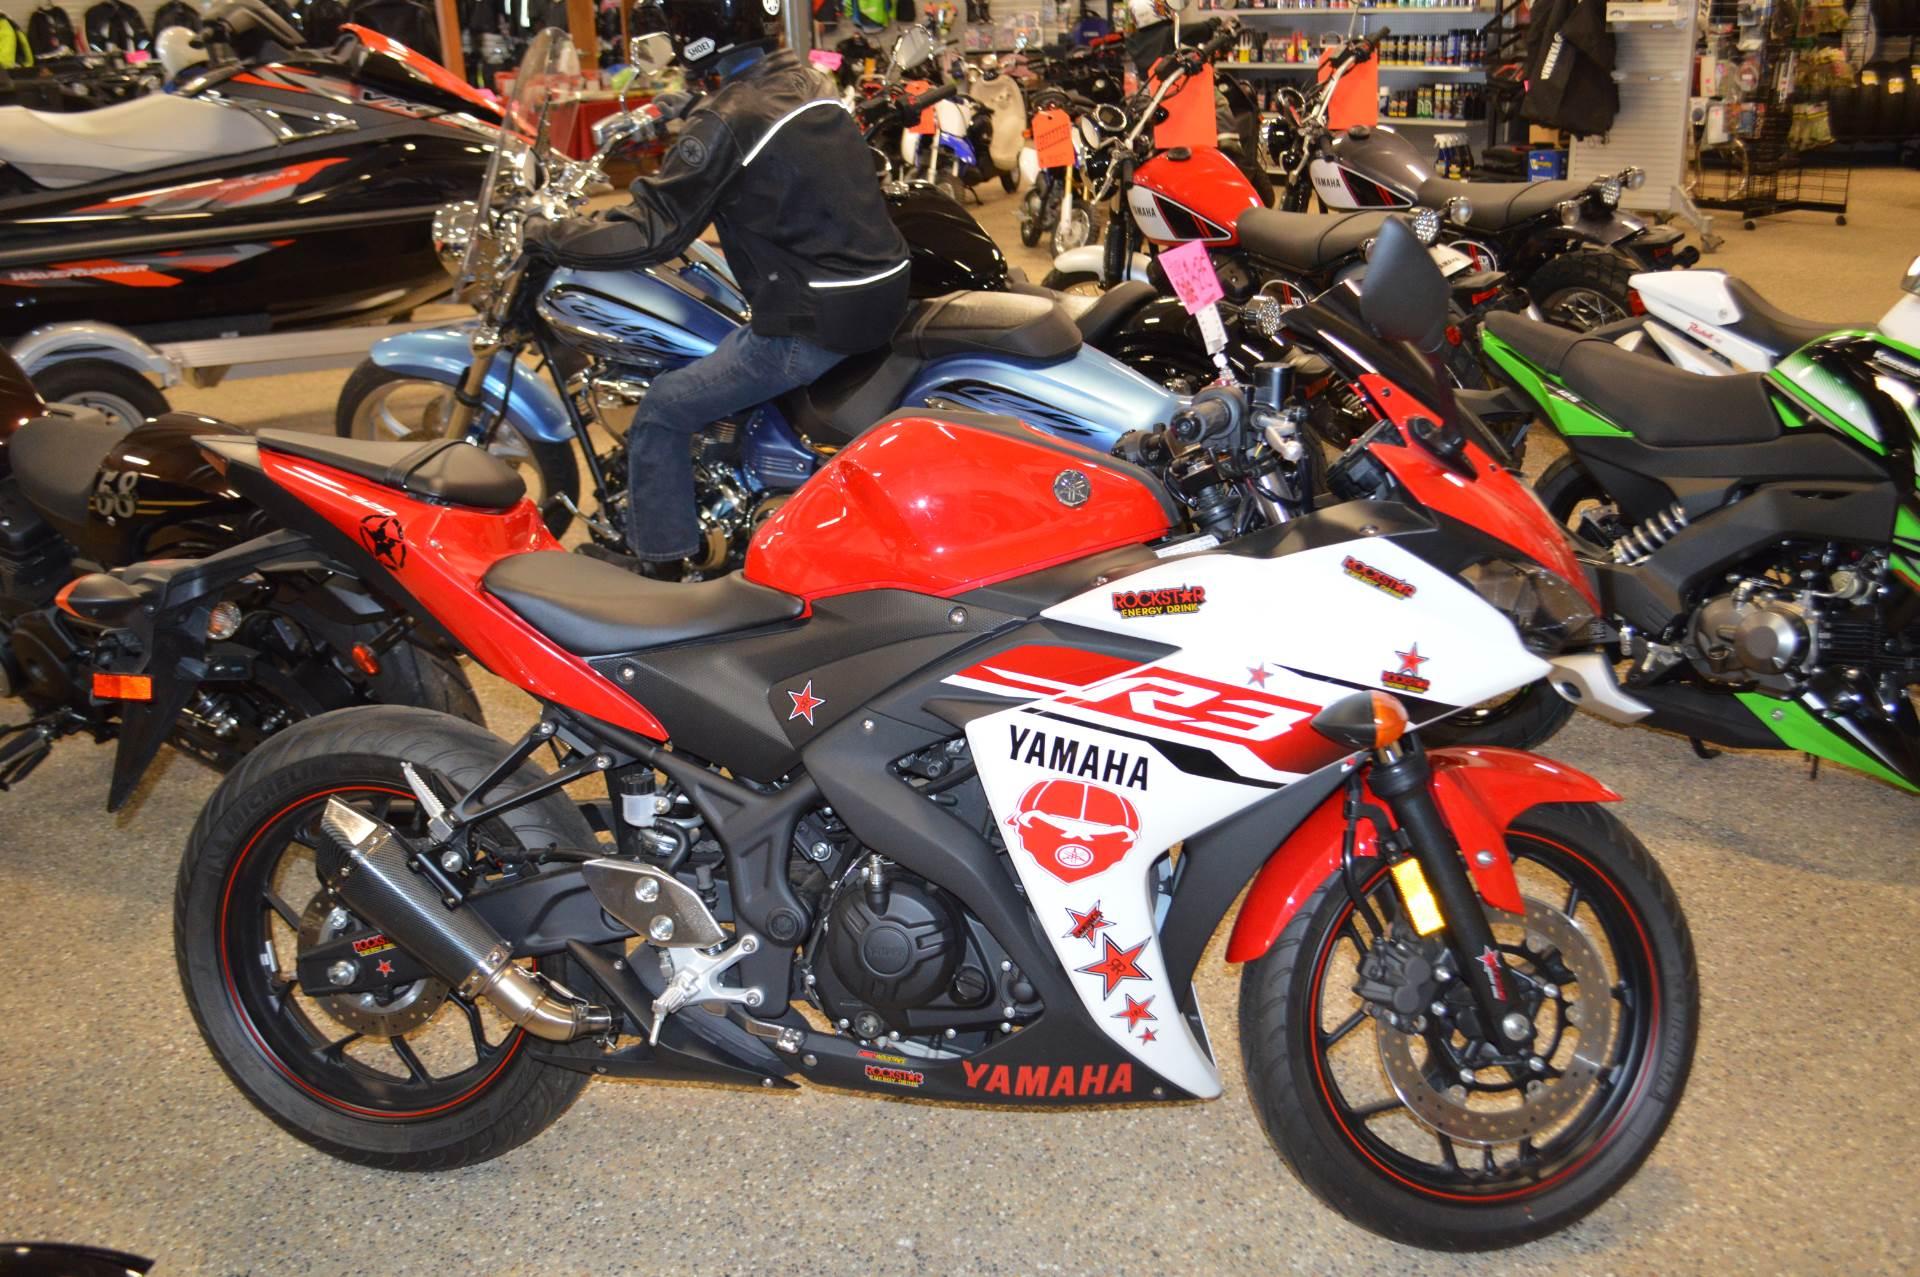 2015 Yamaha YZF-R3 for sale 5302